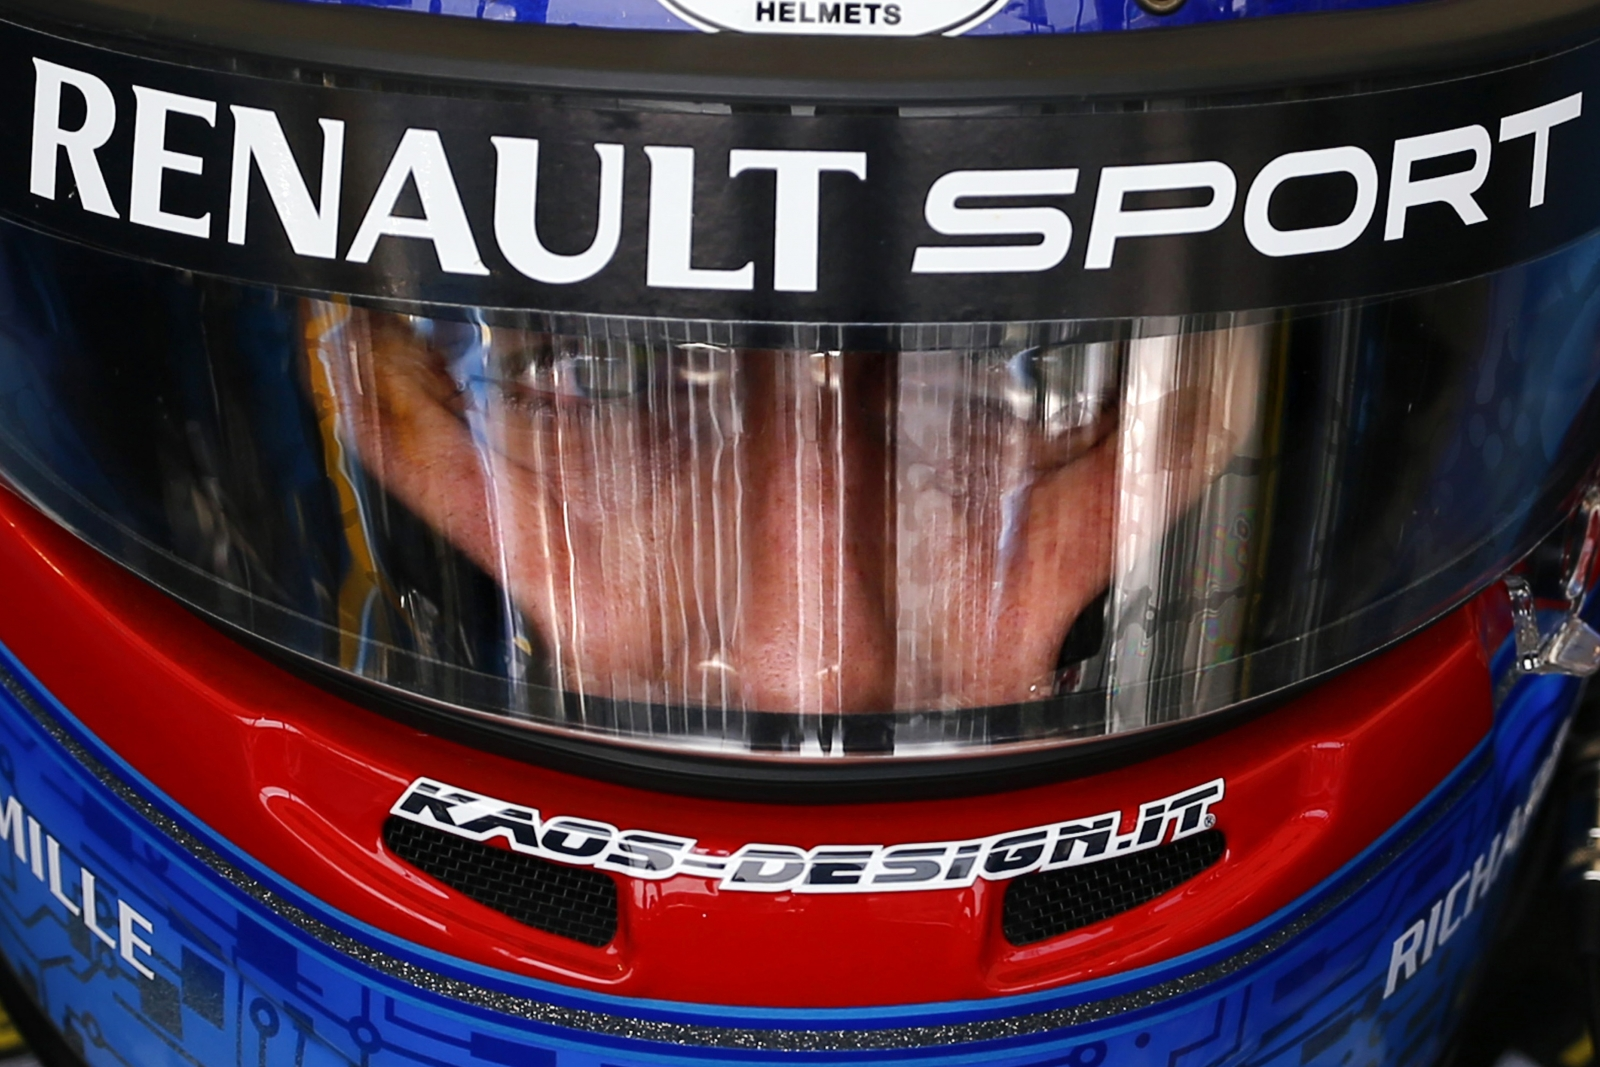 Nicolas Prost Beijing Pit Lane Helmet